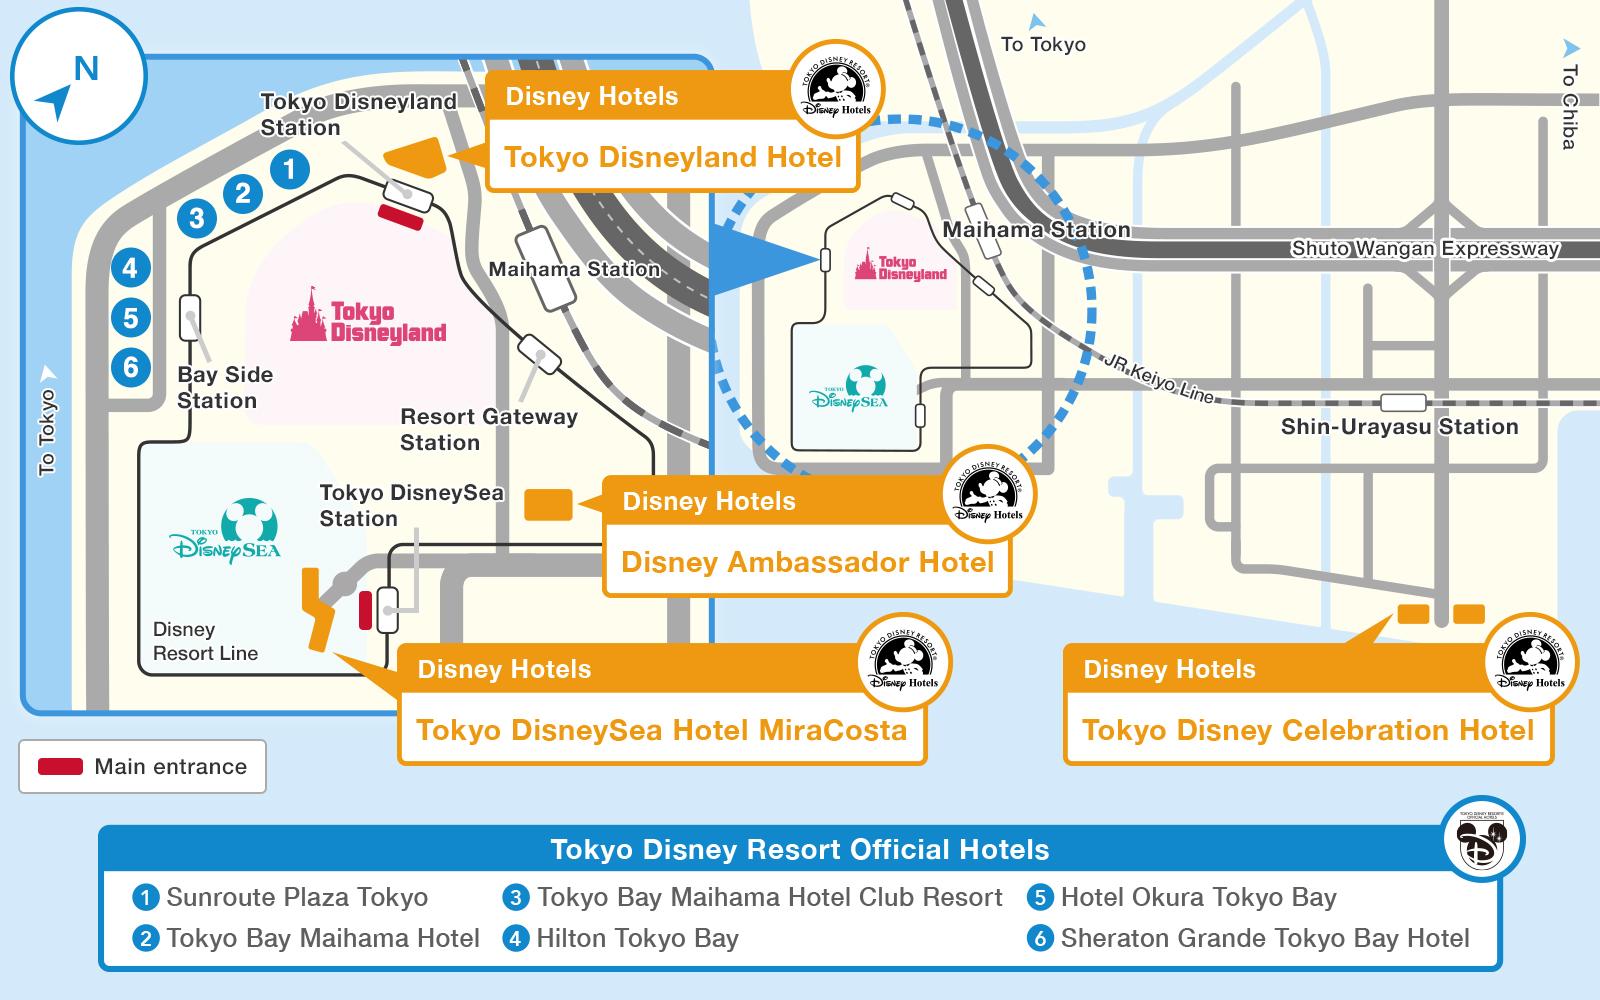 Official]Map|Tokyo Disney Resort on